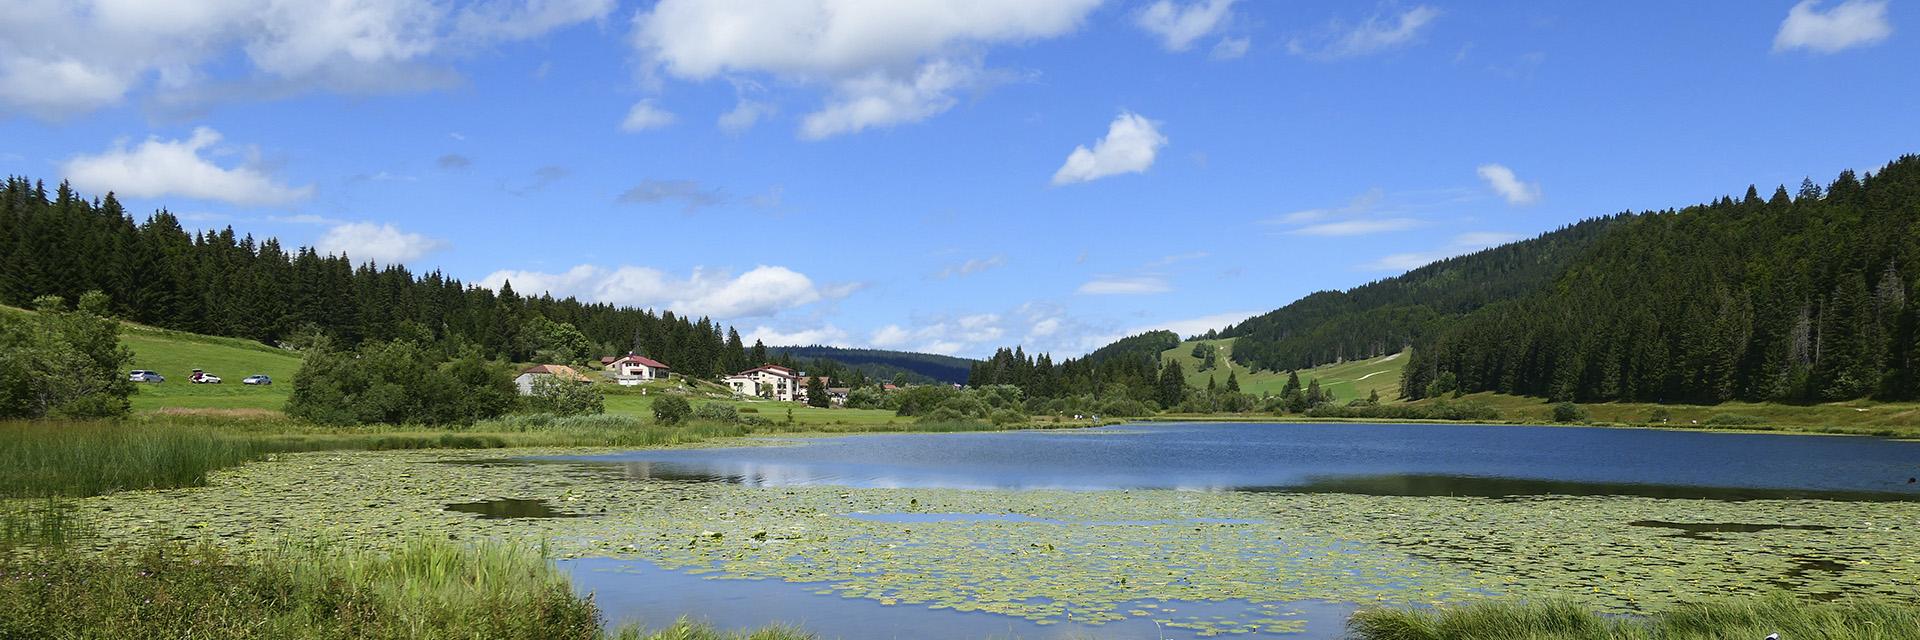 village-vacance-neige-et-plein-air-lac-lamoura